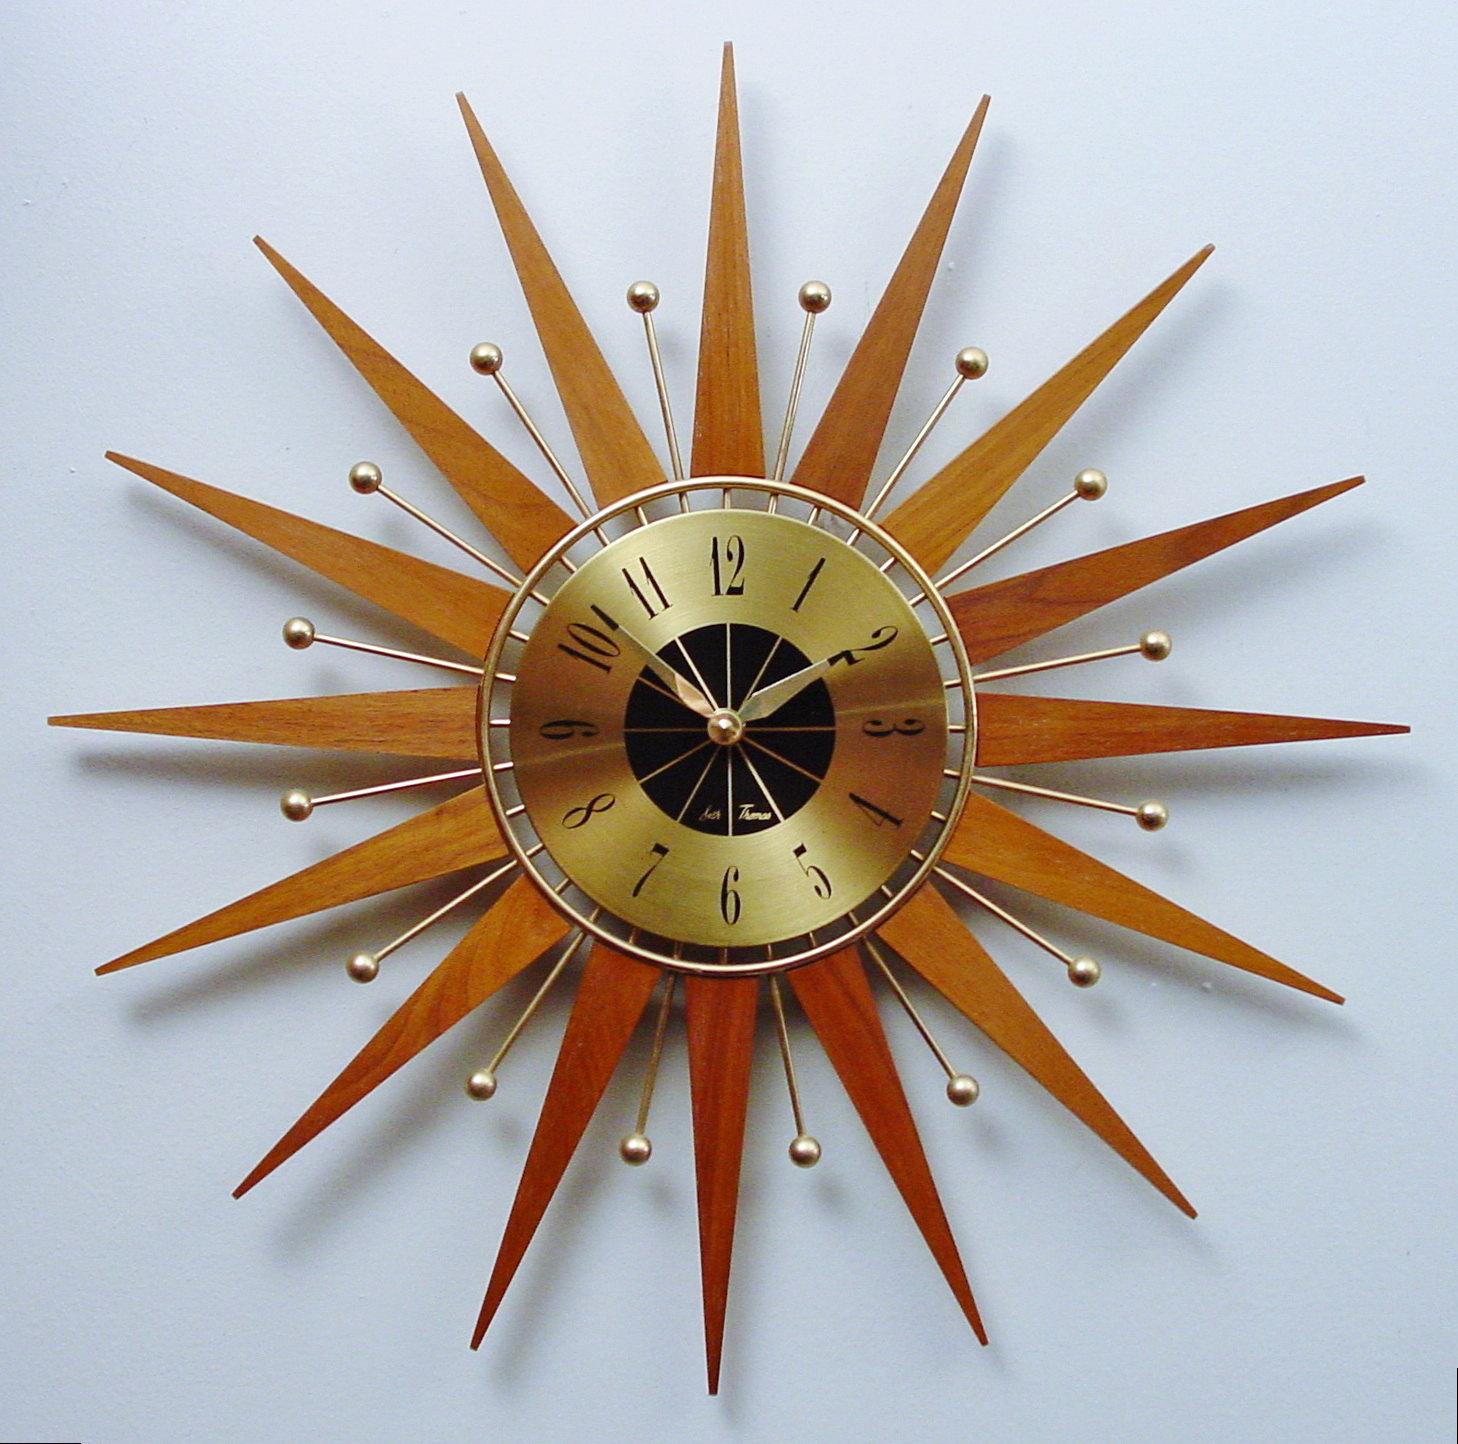 River City Clocks Wine Theme Glass Wall Clock